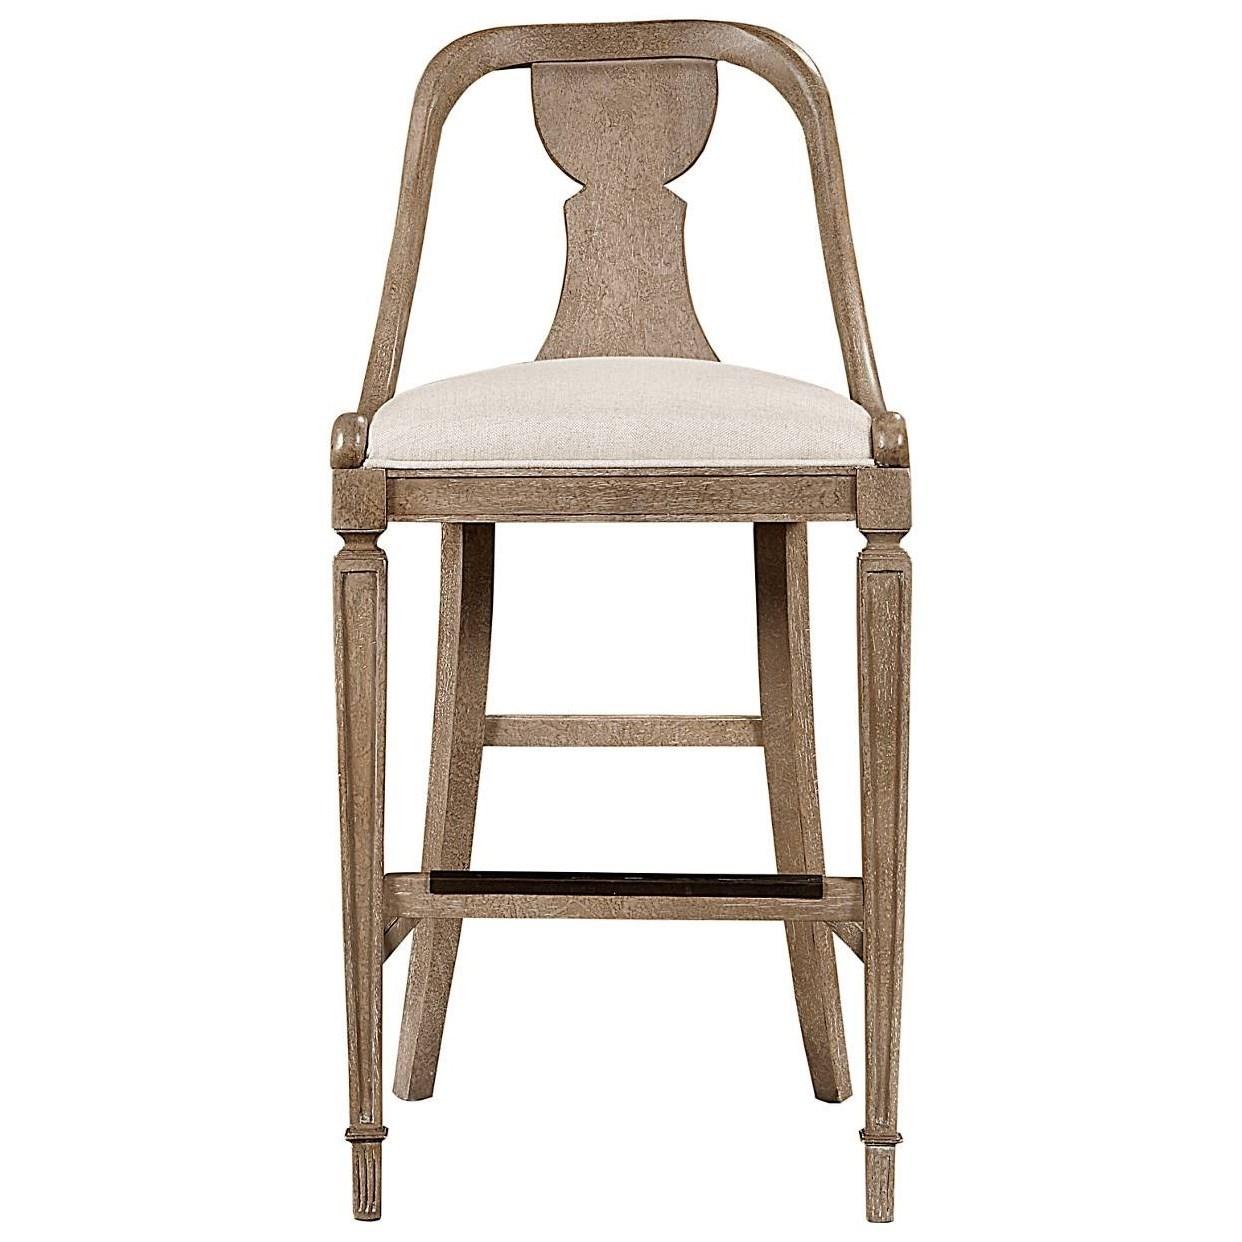 Beau ... Furniture Wethersfield Estate Barstool. Stanley Furniture Wethersfield  EstateBarstool ...